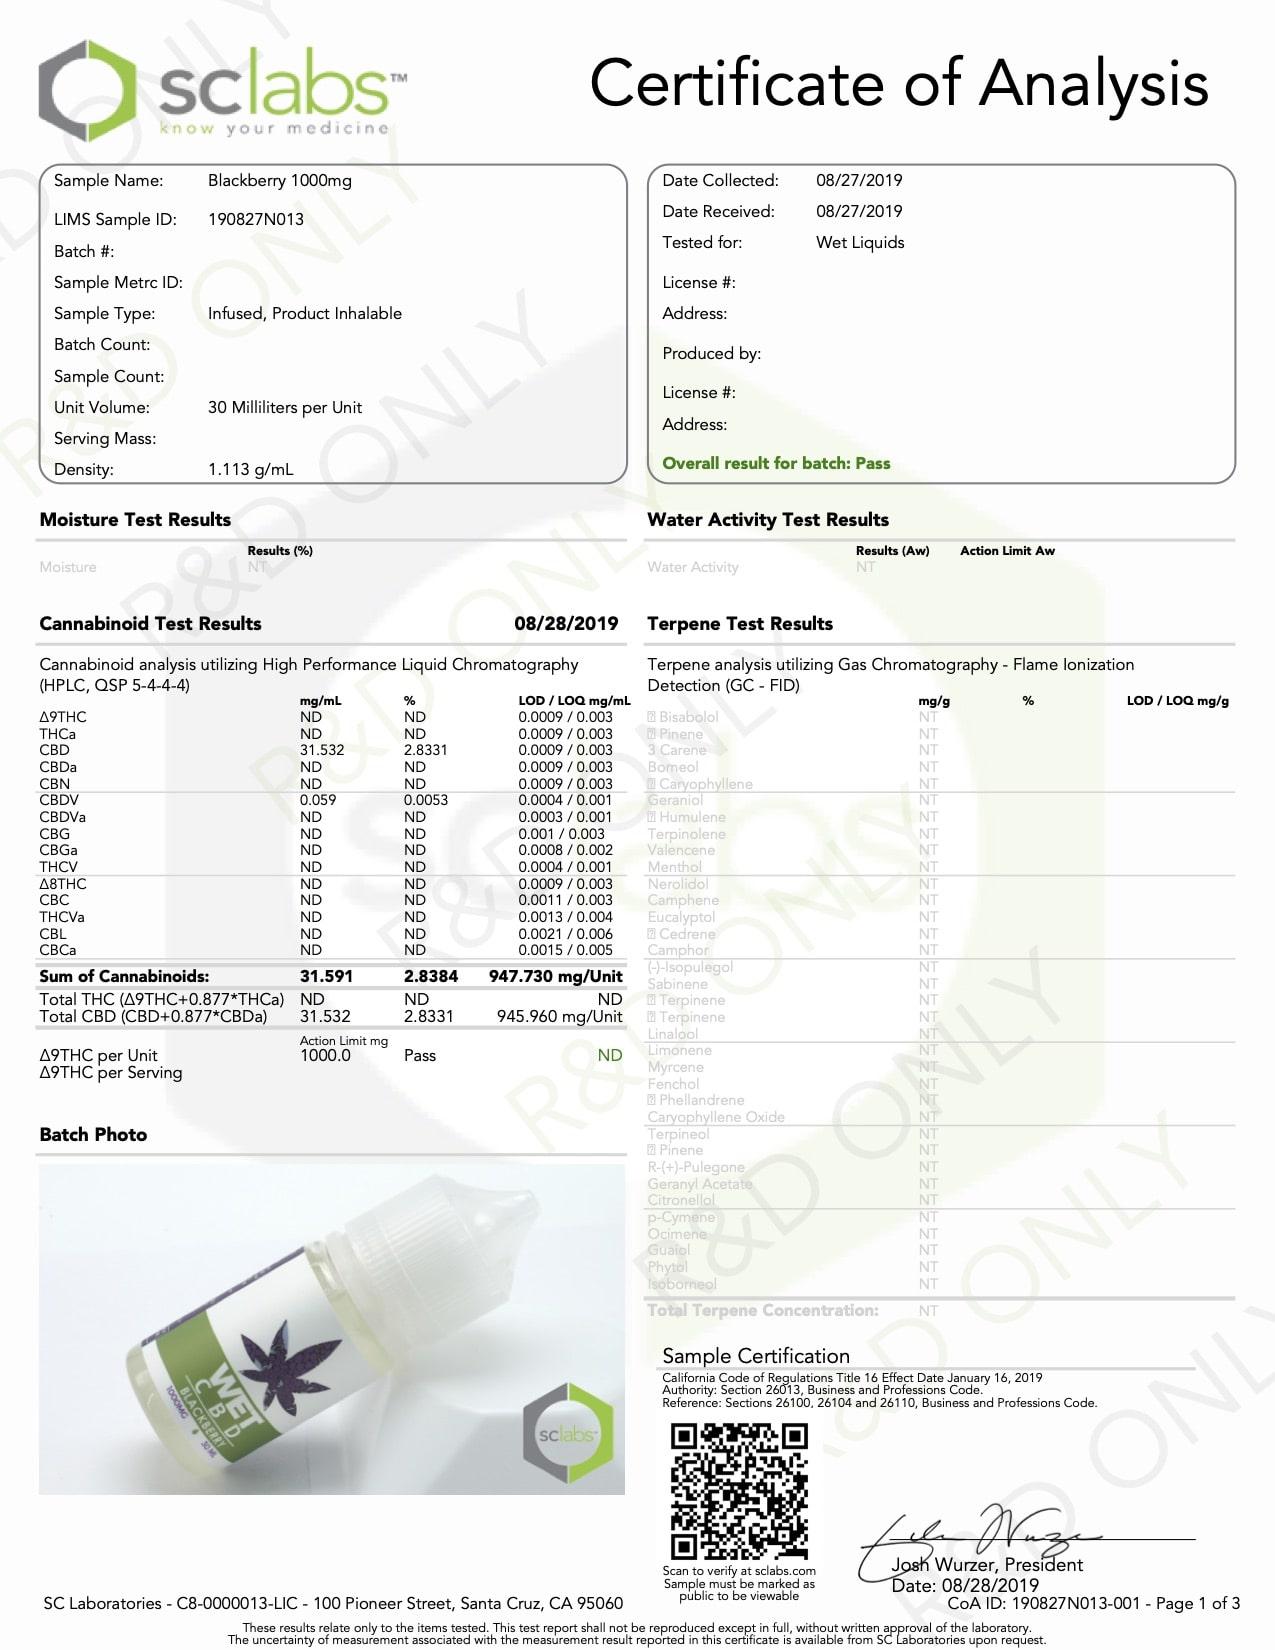 WET CBD Vape Blackberry 1000mg Lab Report